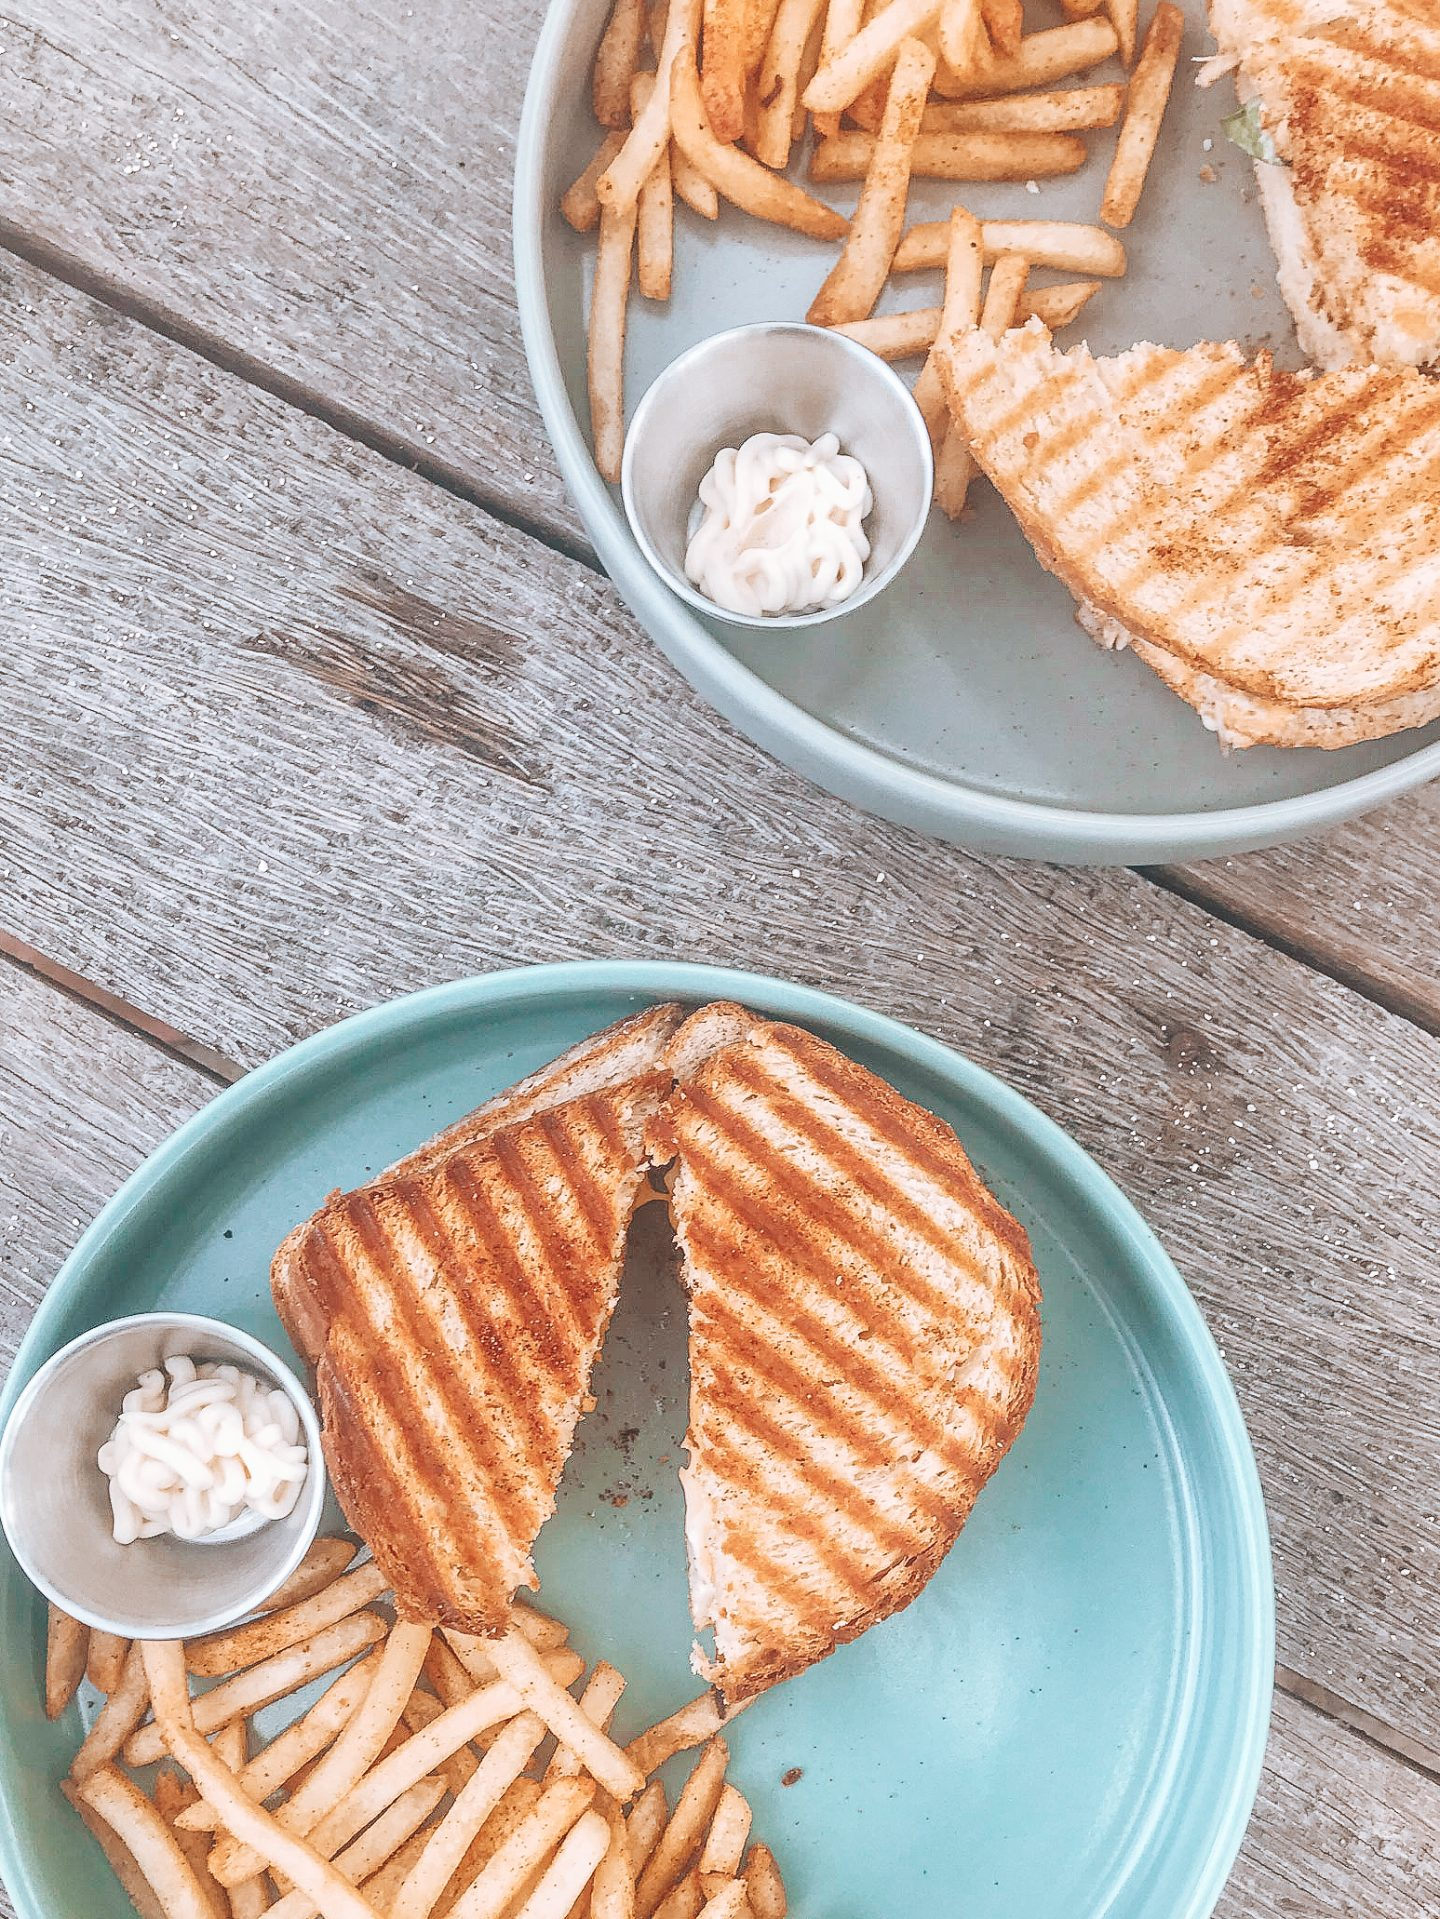 veggie food siargao: Toasties and chips